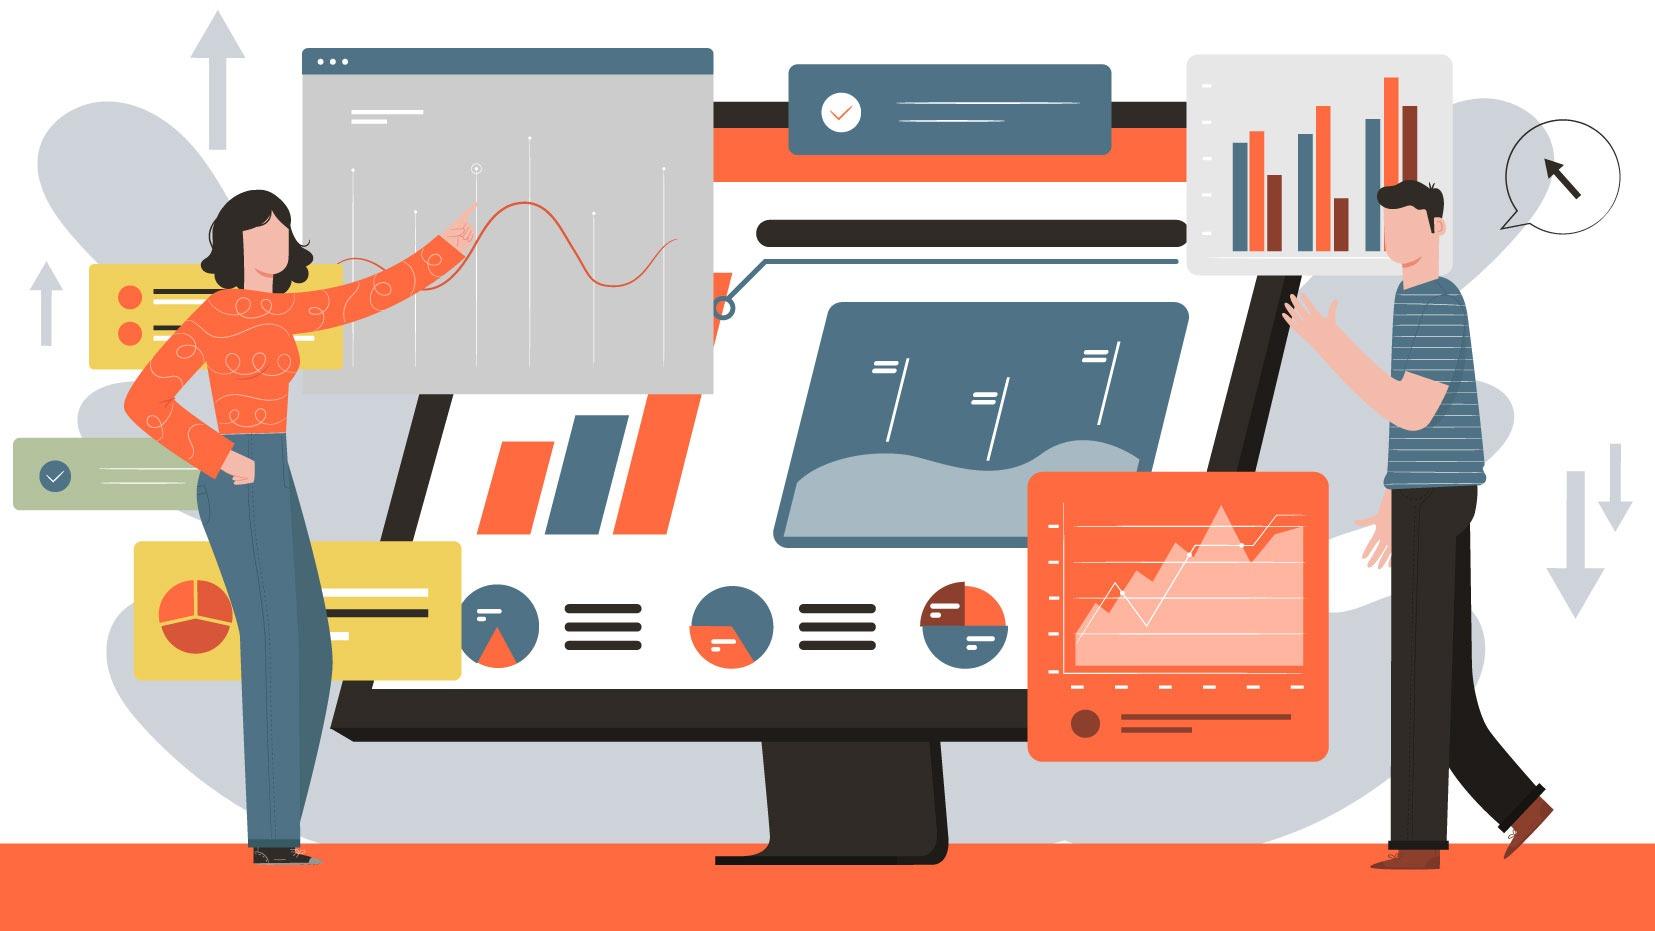 Key Statistics about Core Web Vitals